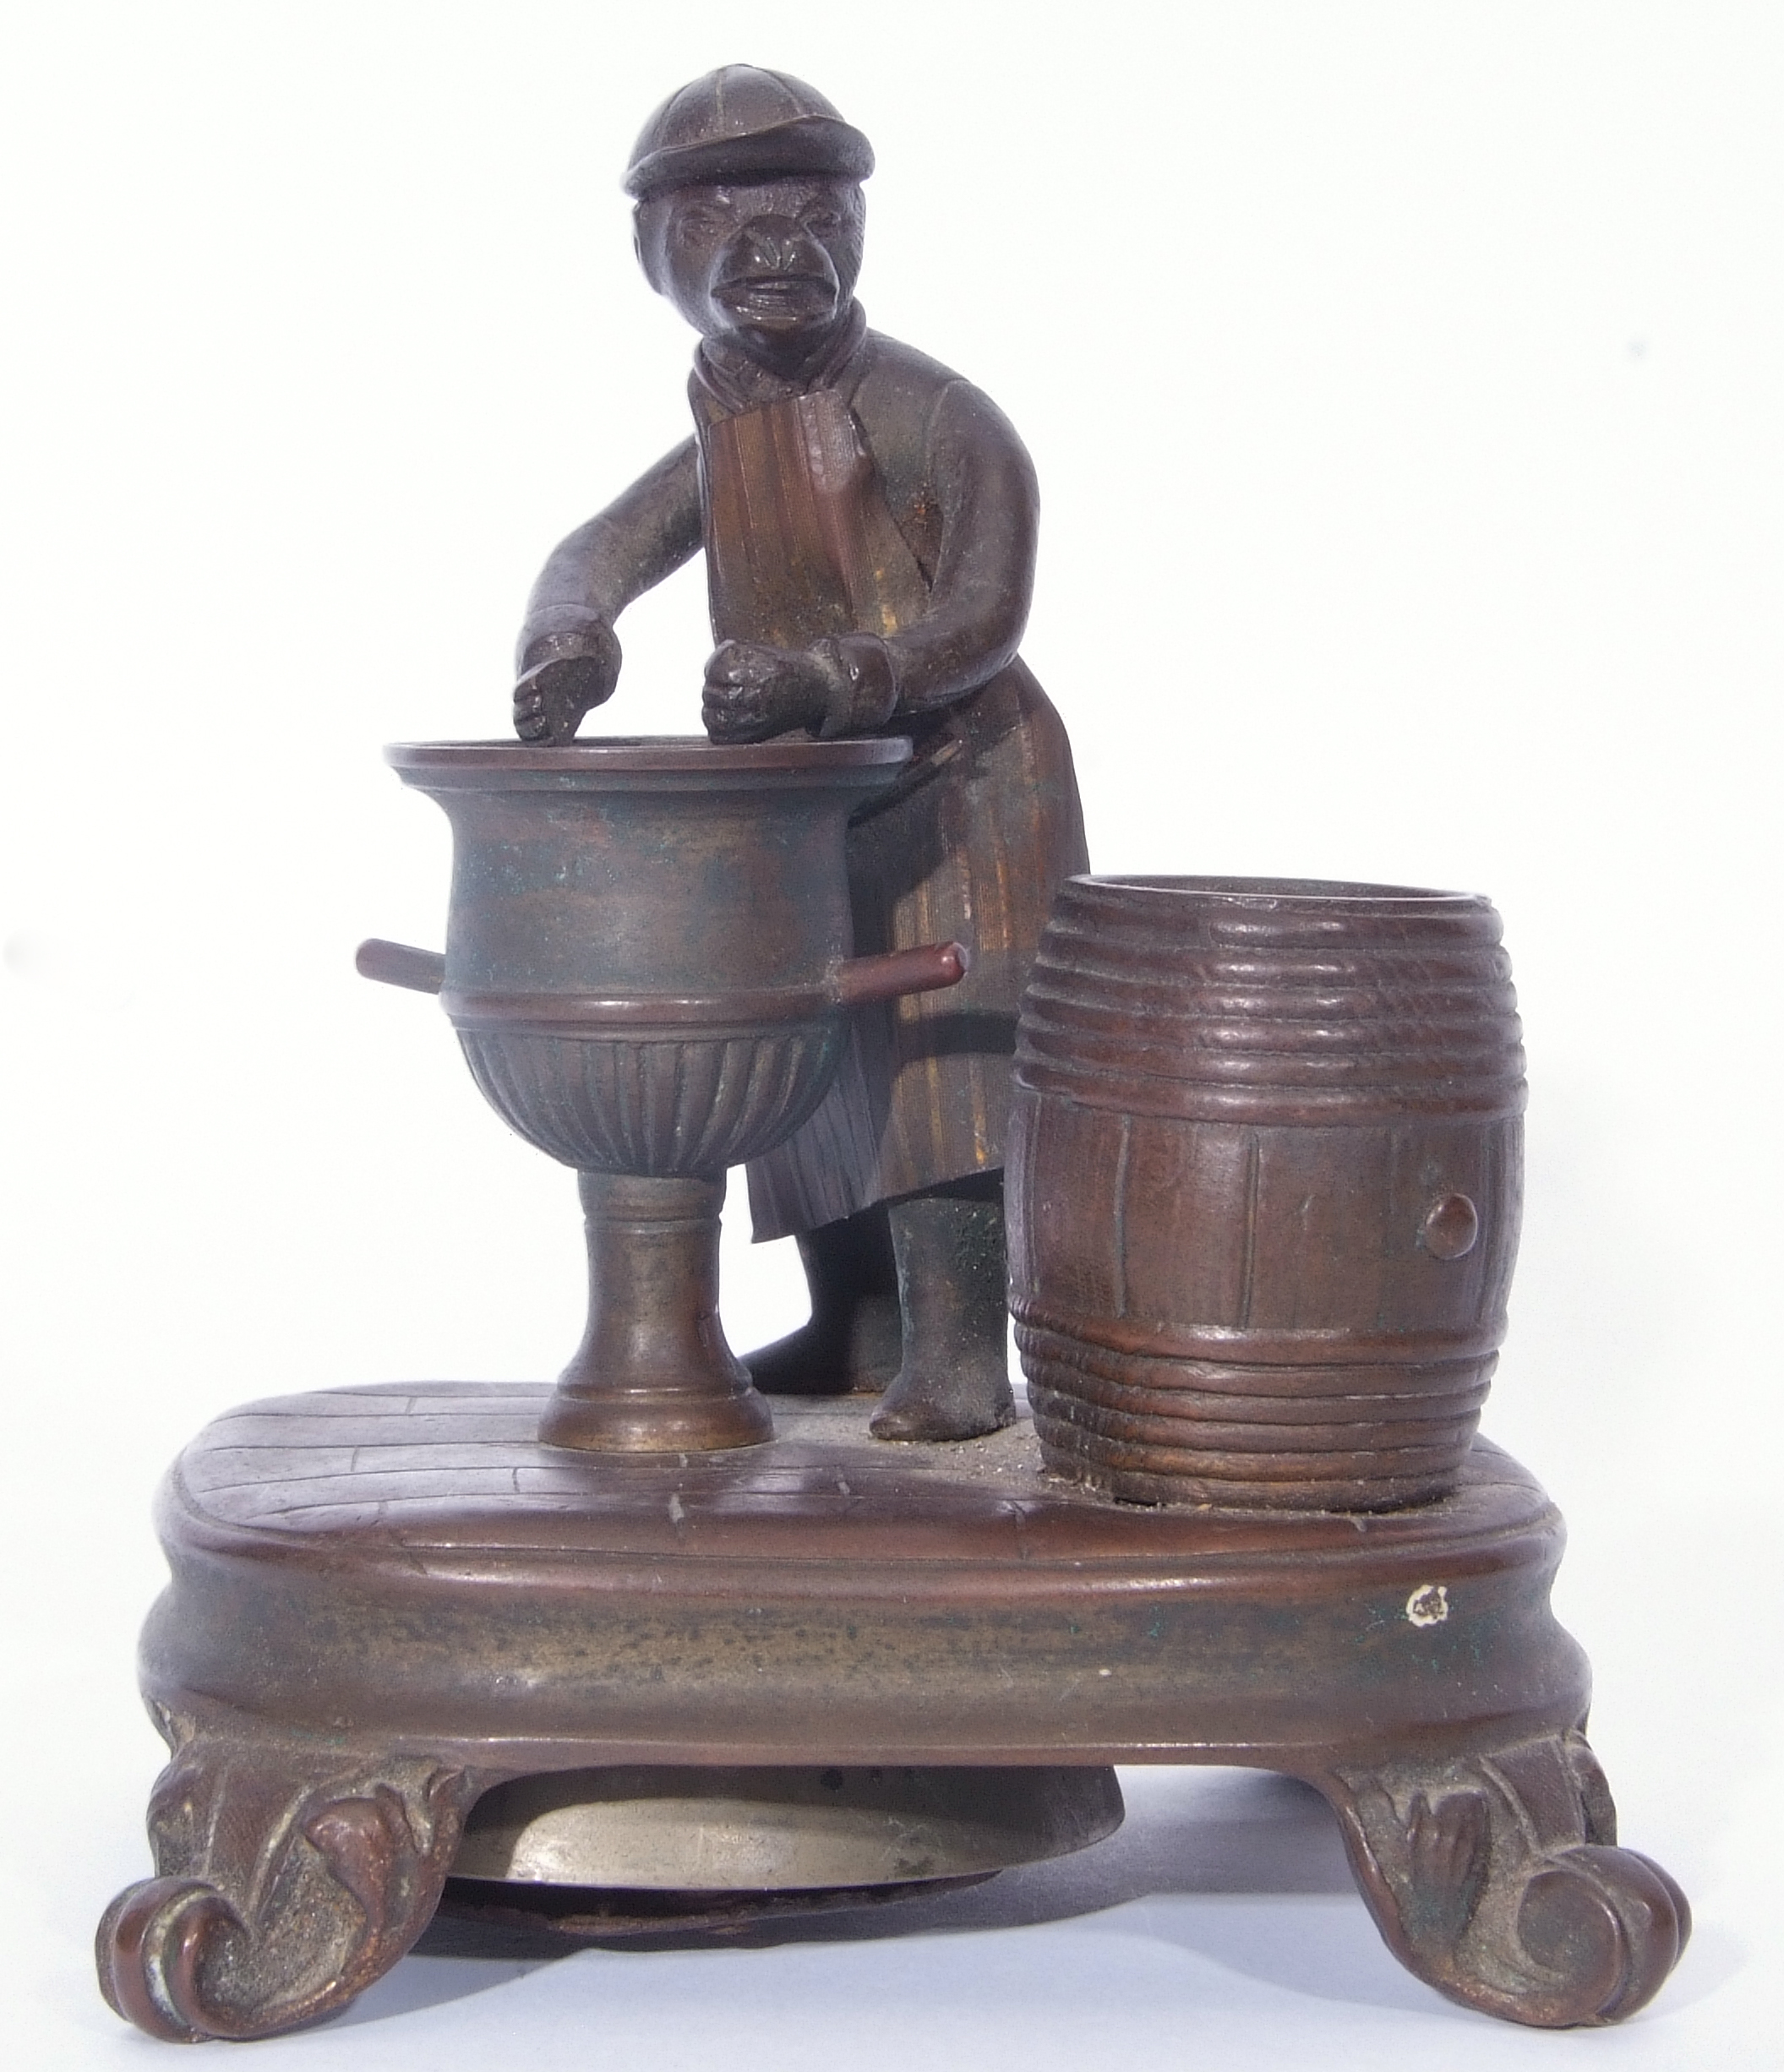 Antique bronze desk bell, a model of a monkey - Image 2 of 11